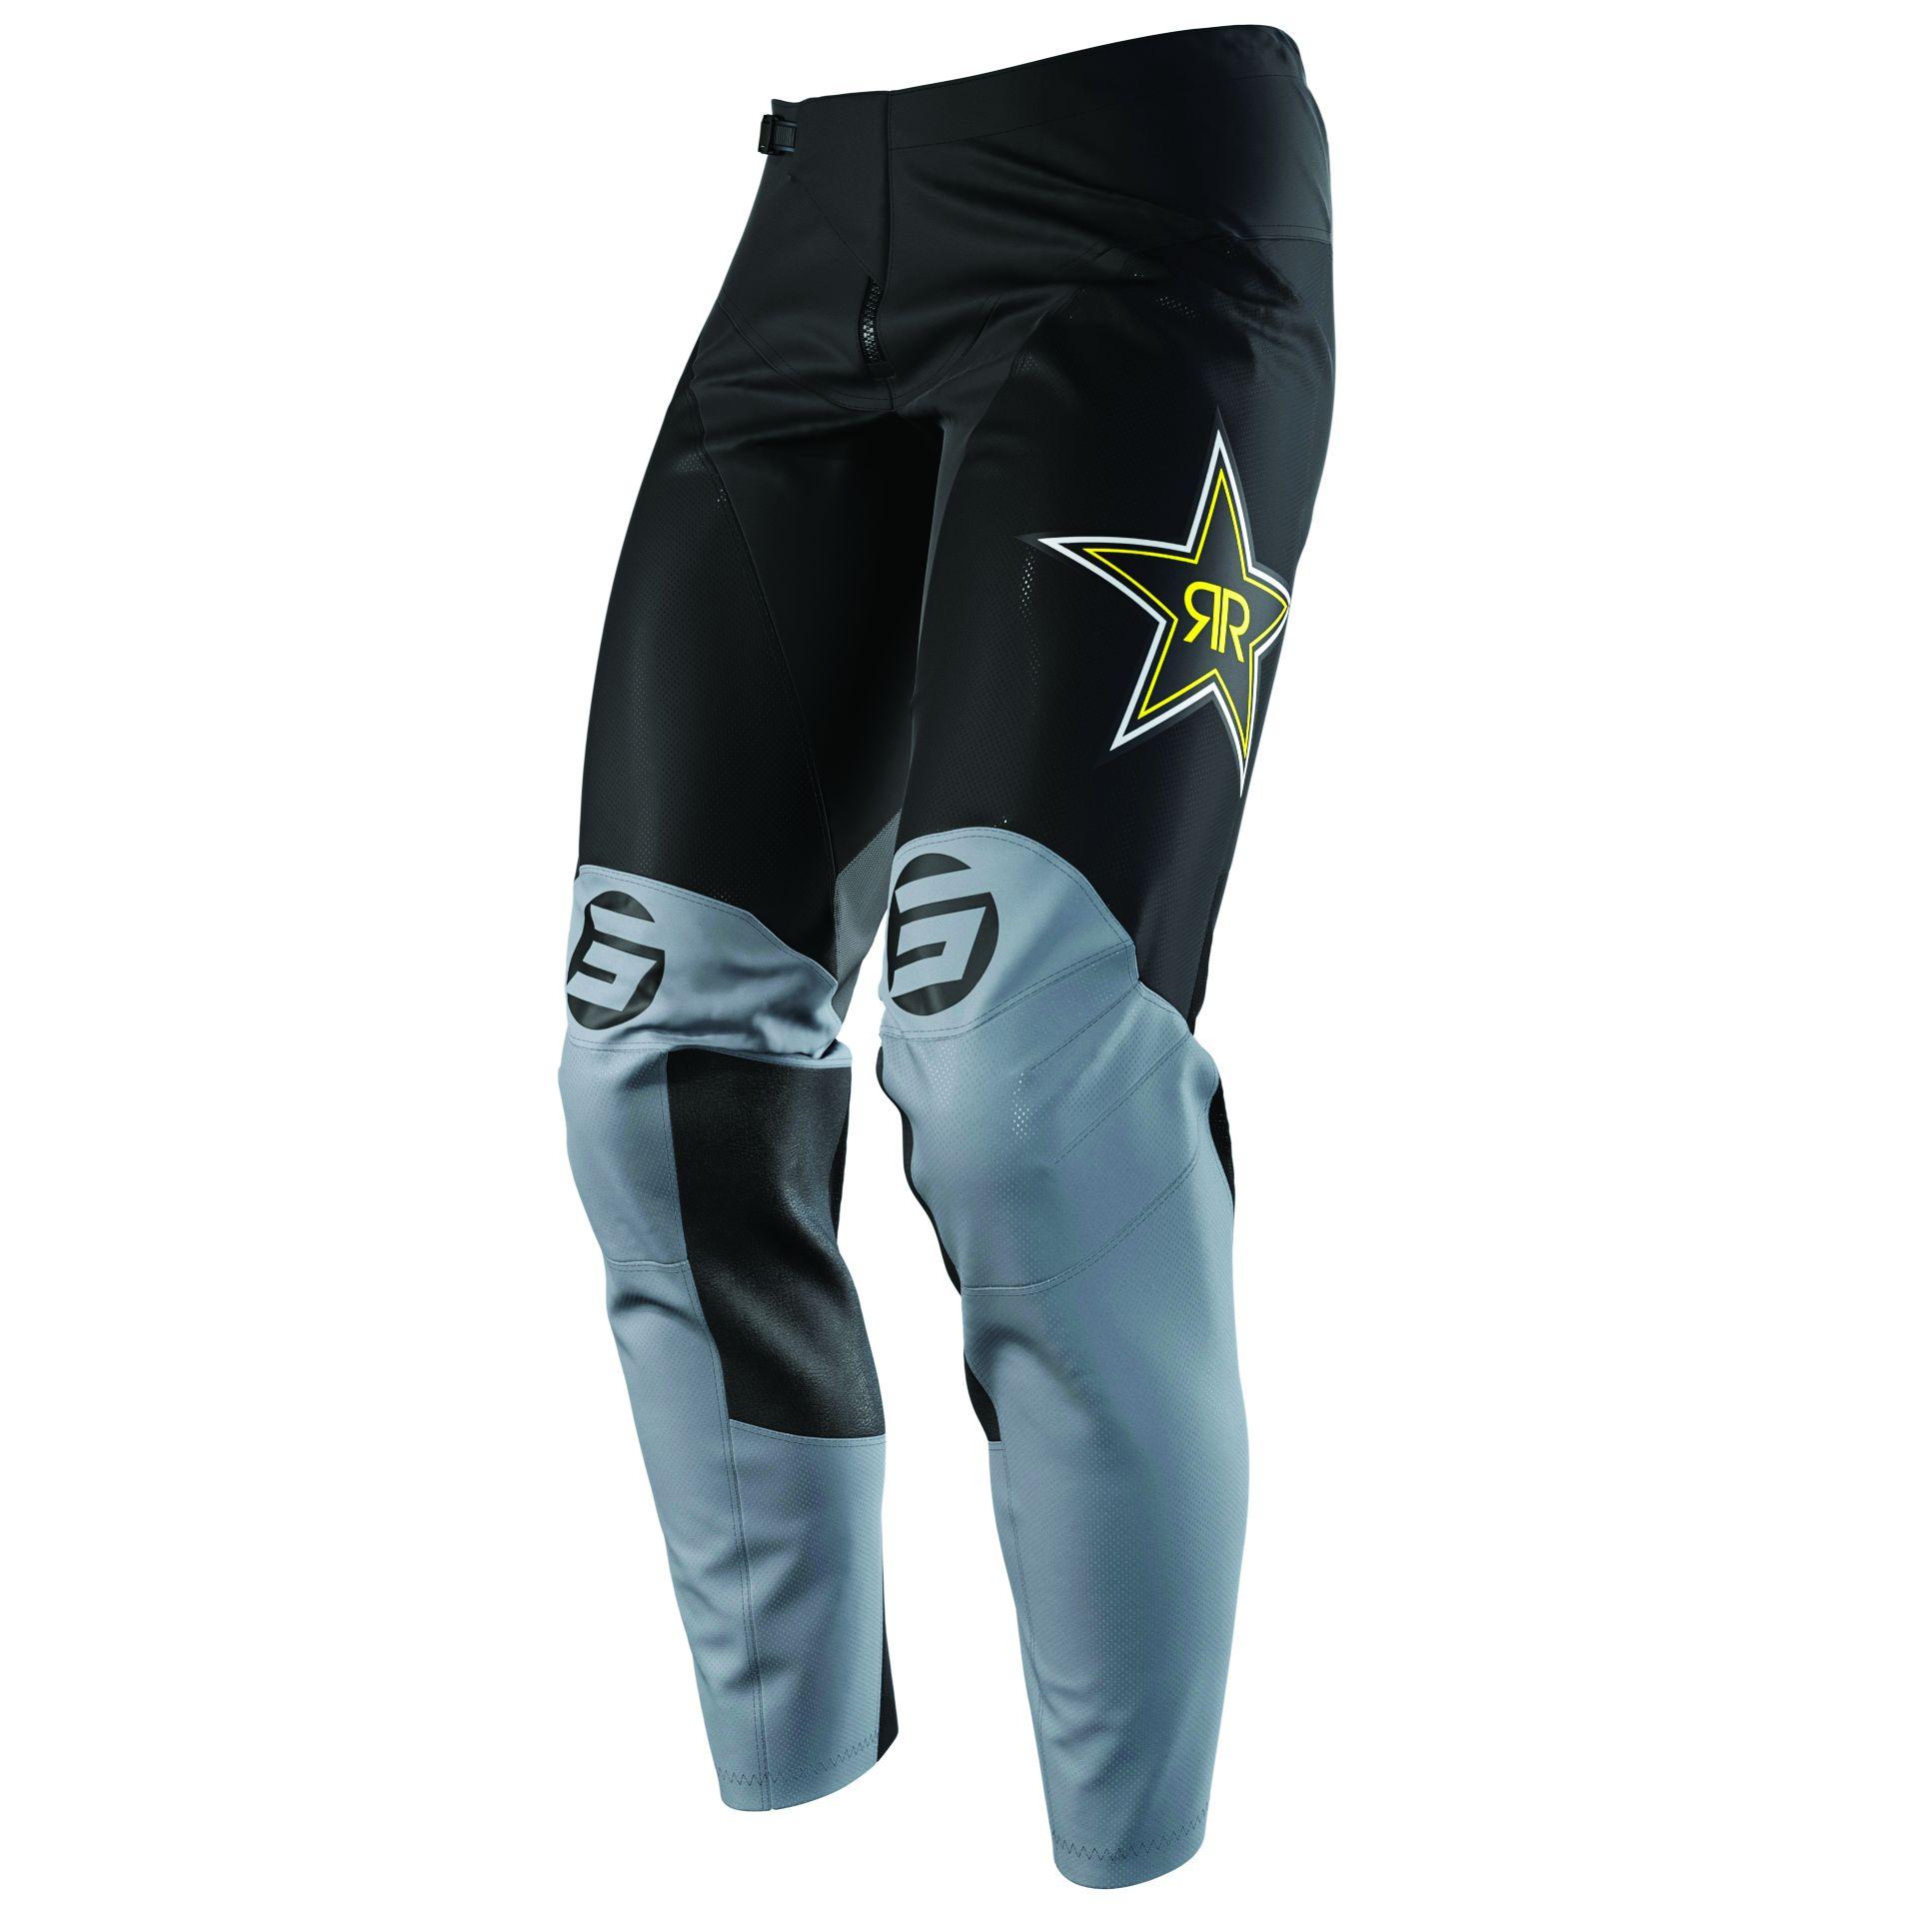 Pantalon cross Shot CONTACT REPLICA - ROCKSTAR - LIMITED EDITION 2021